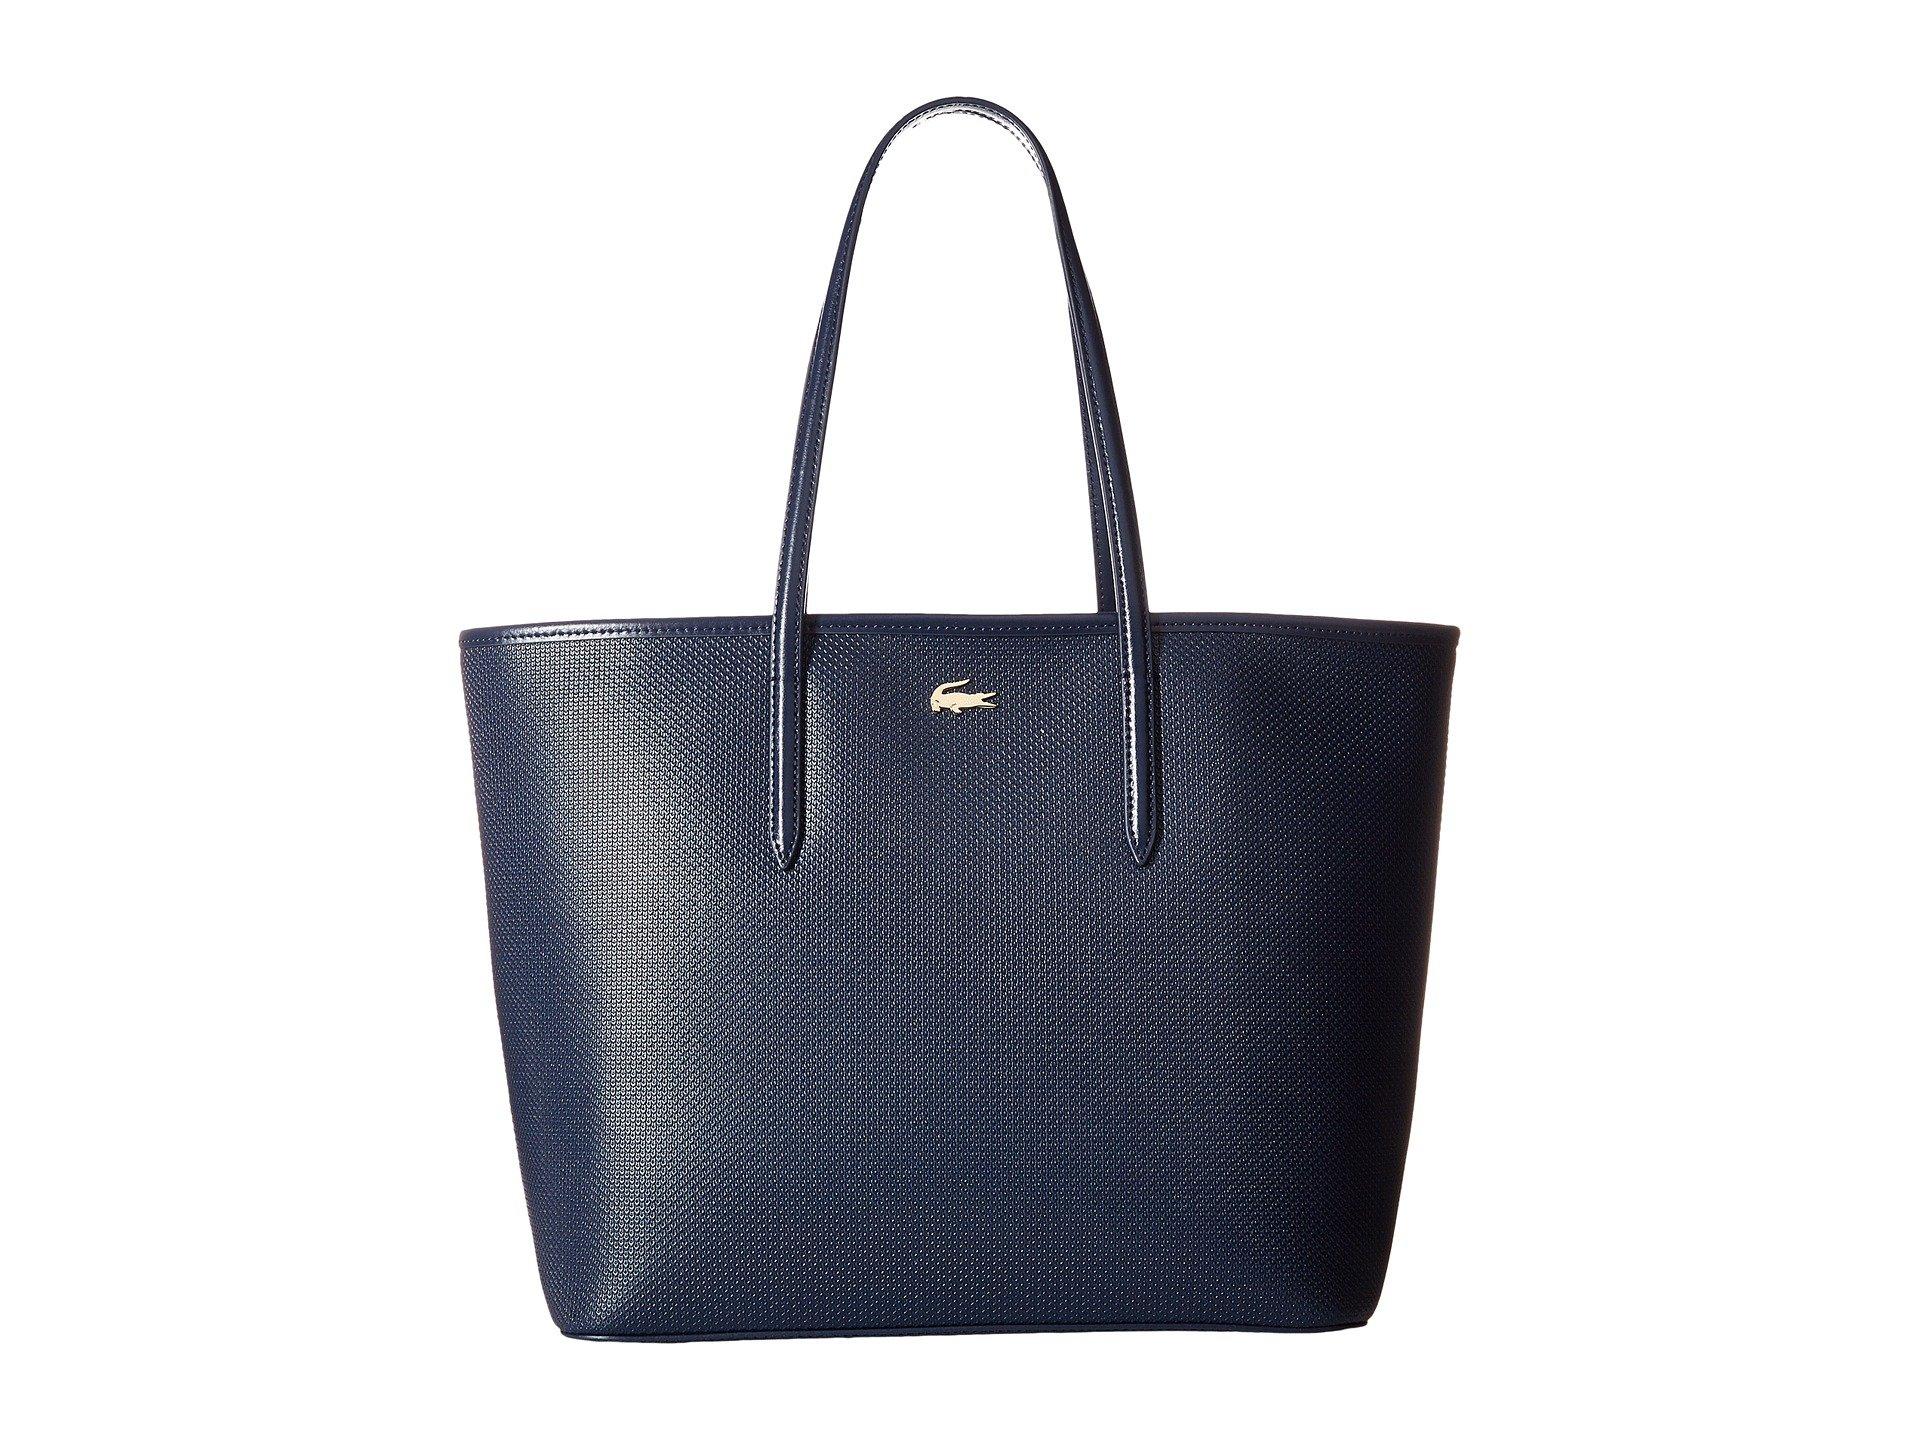 Bolso de Mano para Mujer Lacoste Chantaco Zip Shopping Bag  + Lacoste en VeoyCompro.net